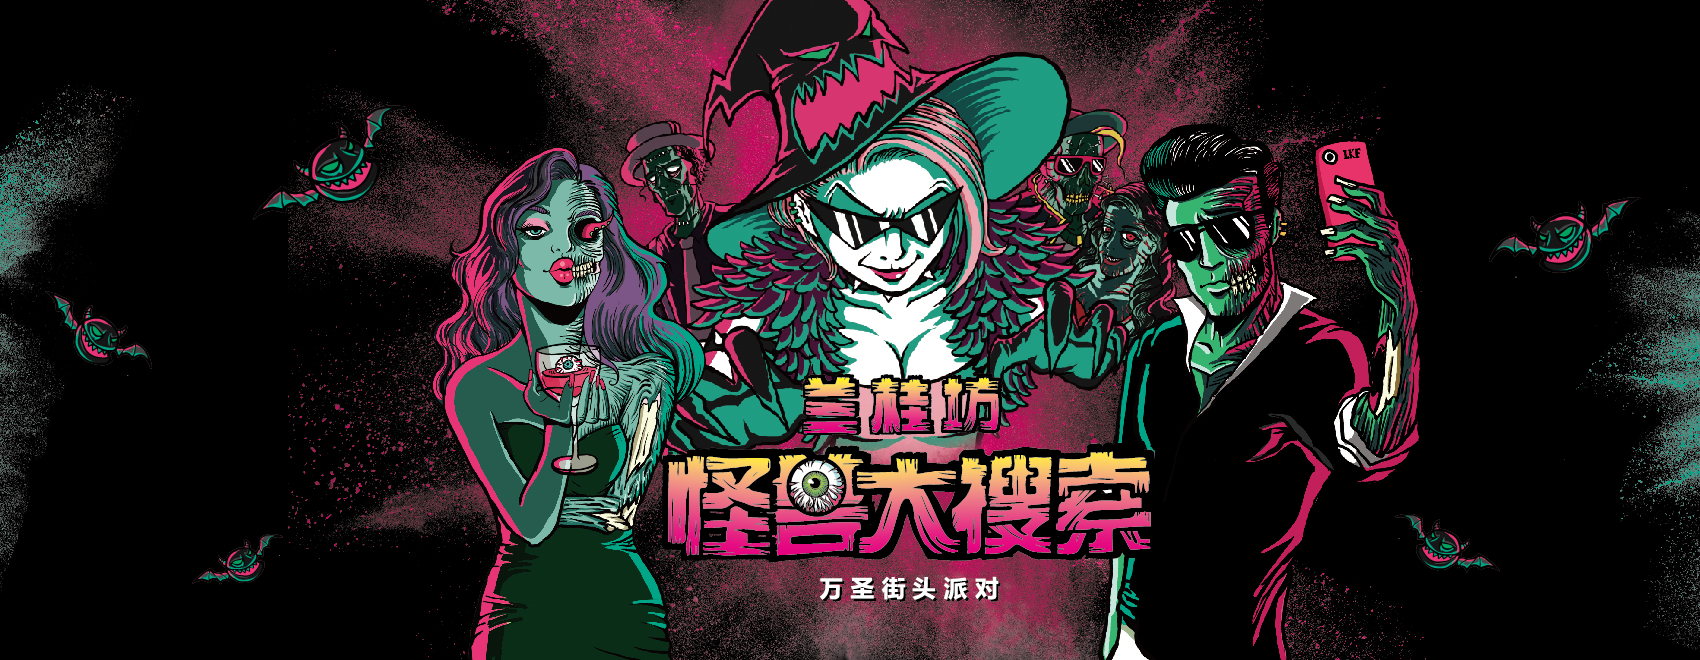 2016-halloween-web-banner-01